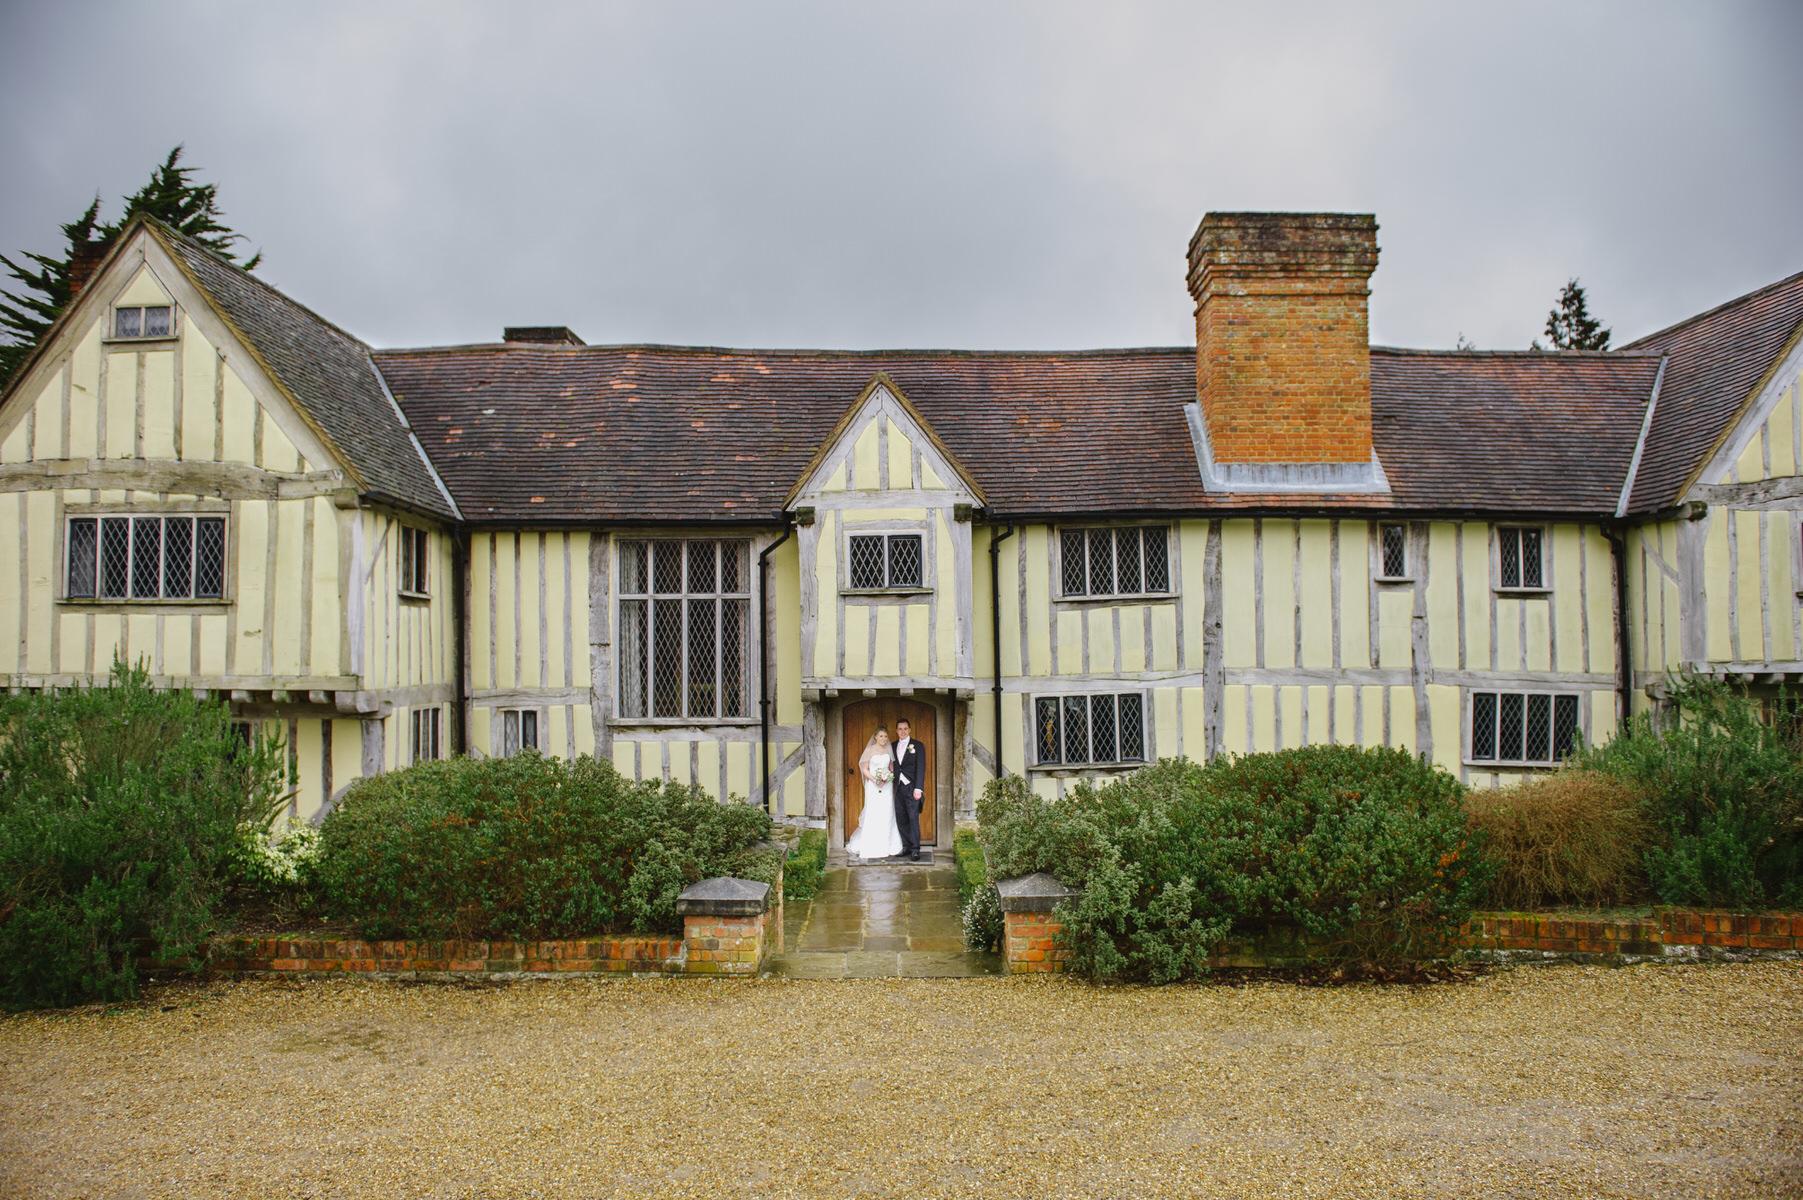 Cain Manor wedding in the rain